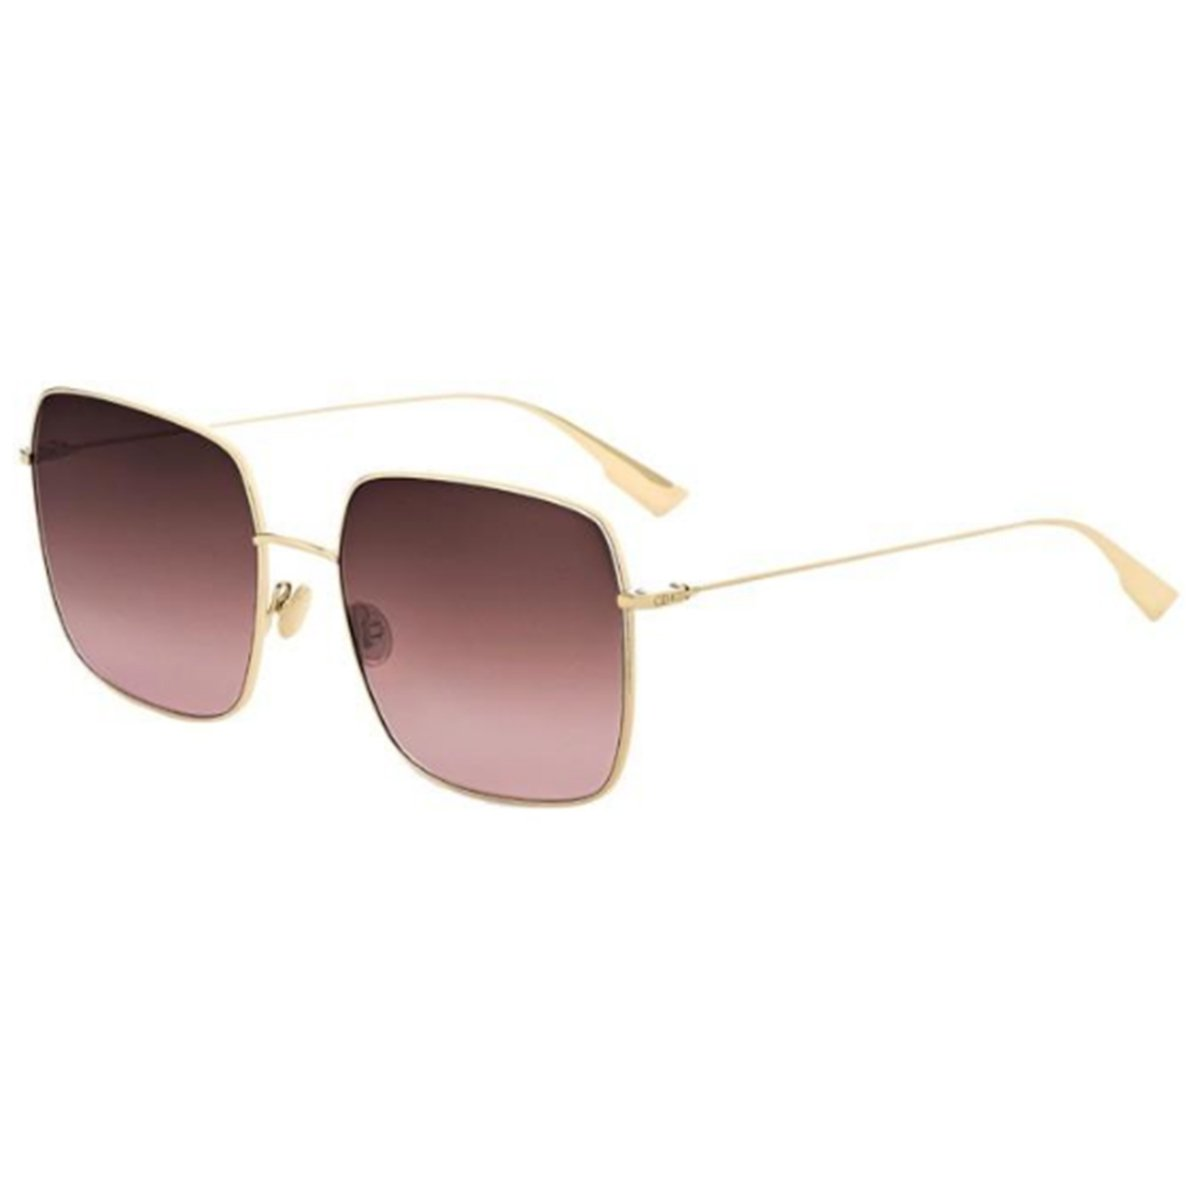 6f5373694599f Compre Óculos de Sol Dior Stellaire 1 em 10X